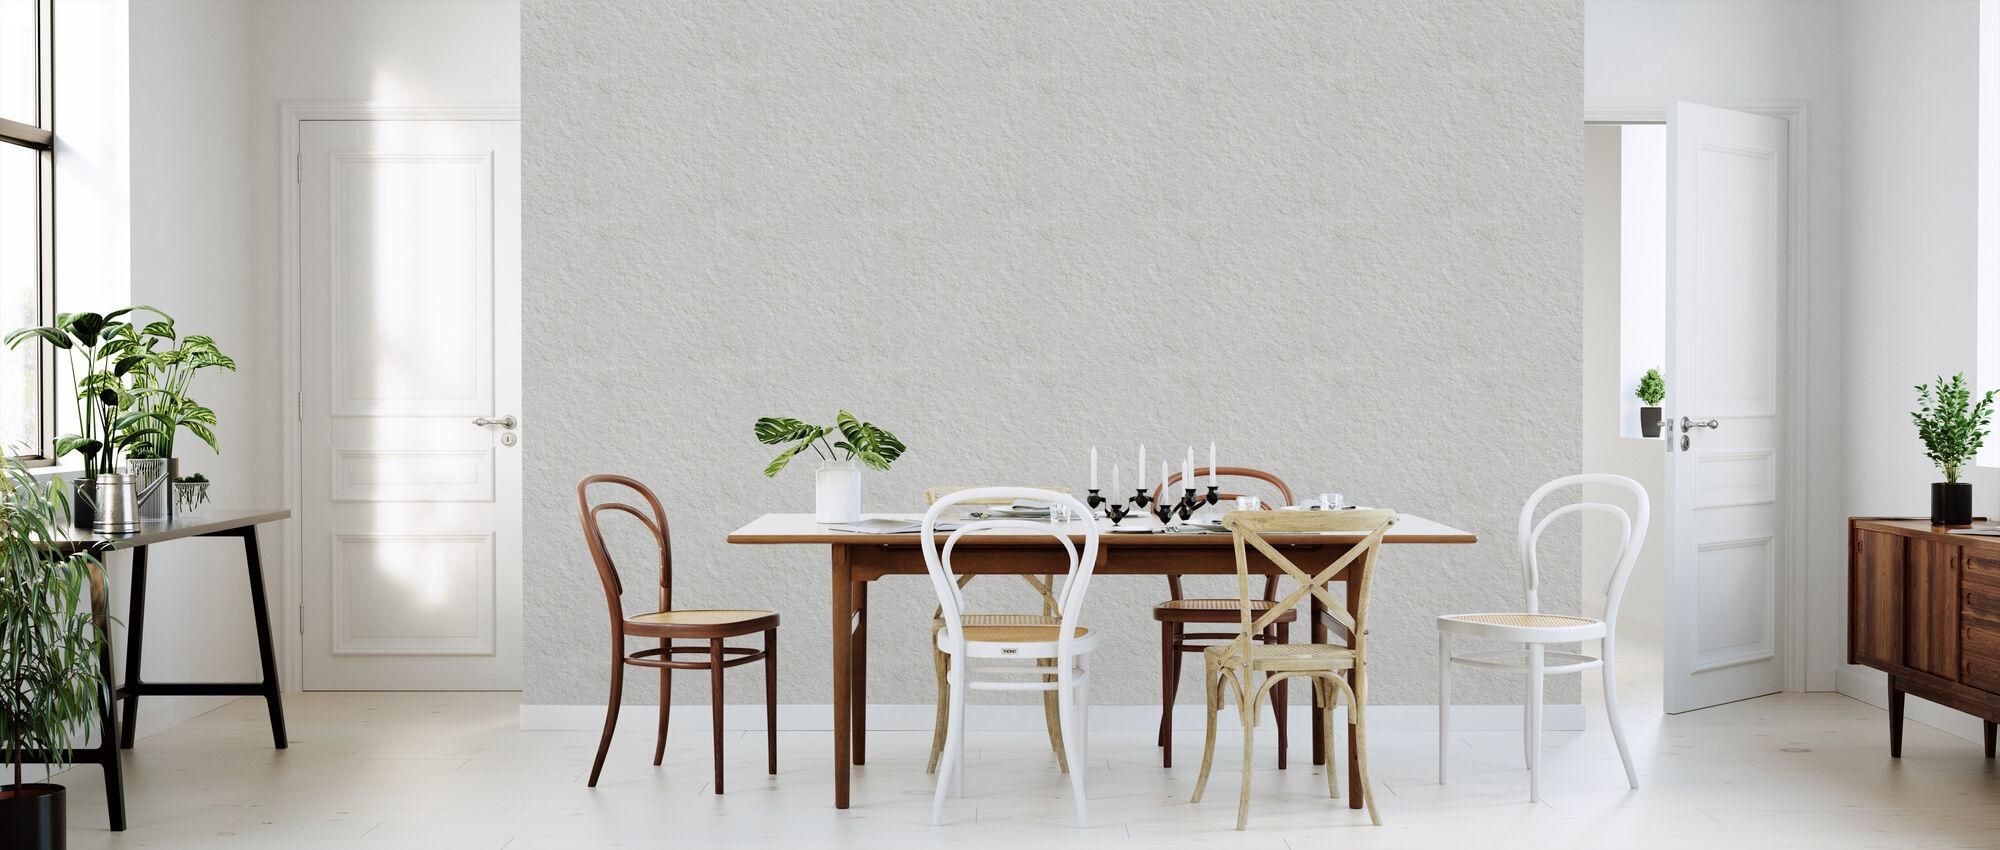 Smoth Steen Textuur - Behang - Keuken